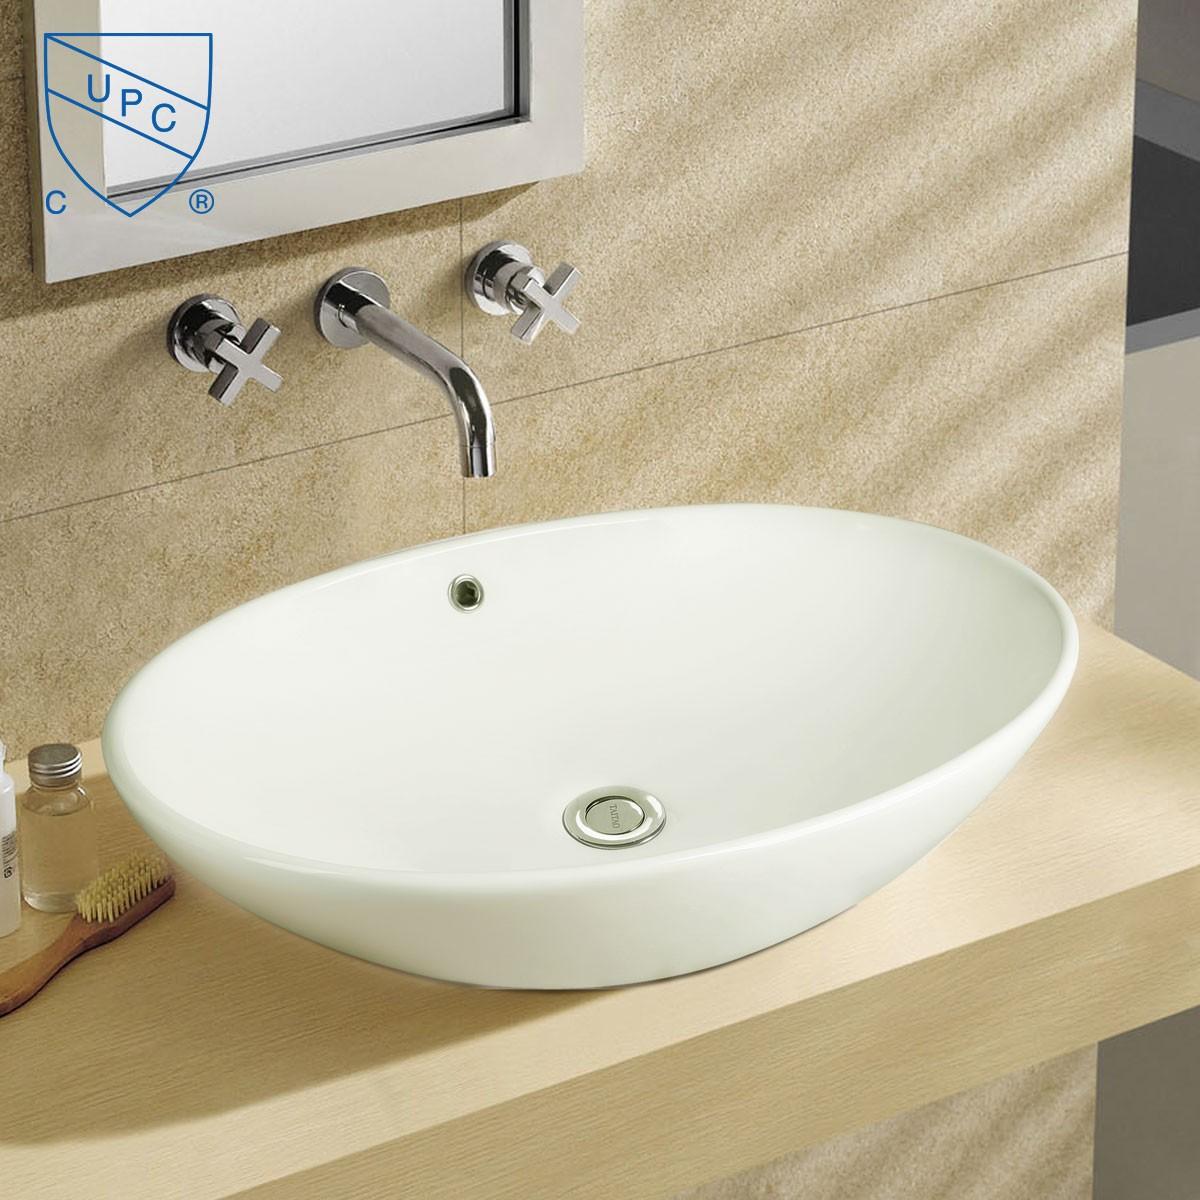 White Ceramic Above Counter Basin (DK-LSE-8018)